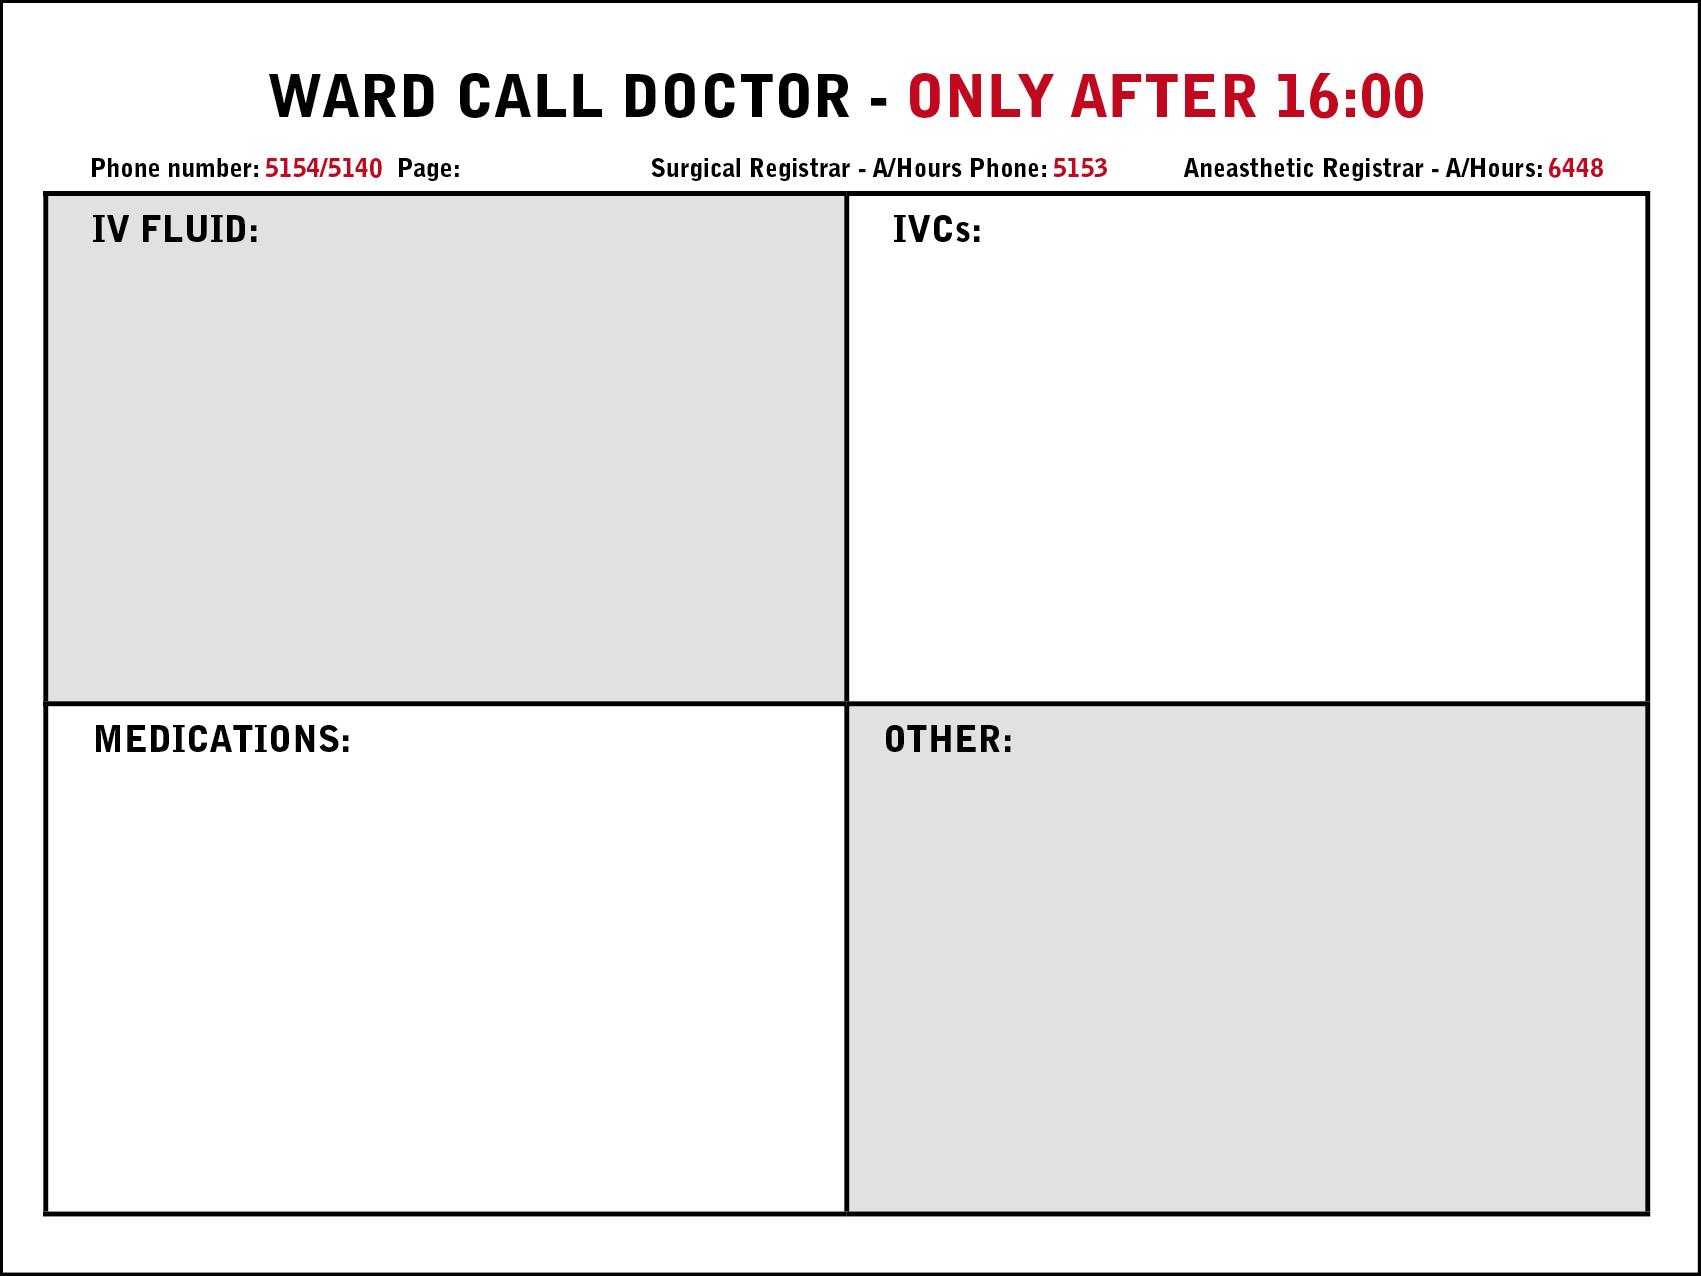 WARD CALL_450x600.jpg